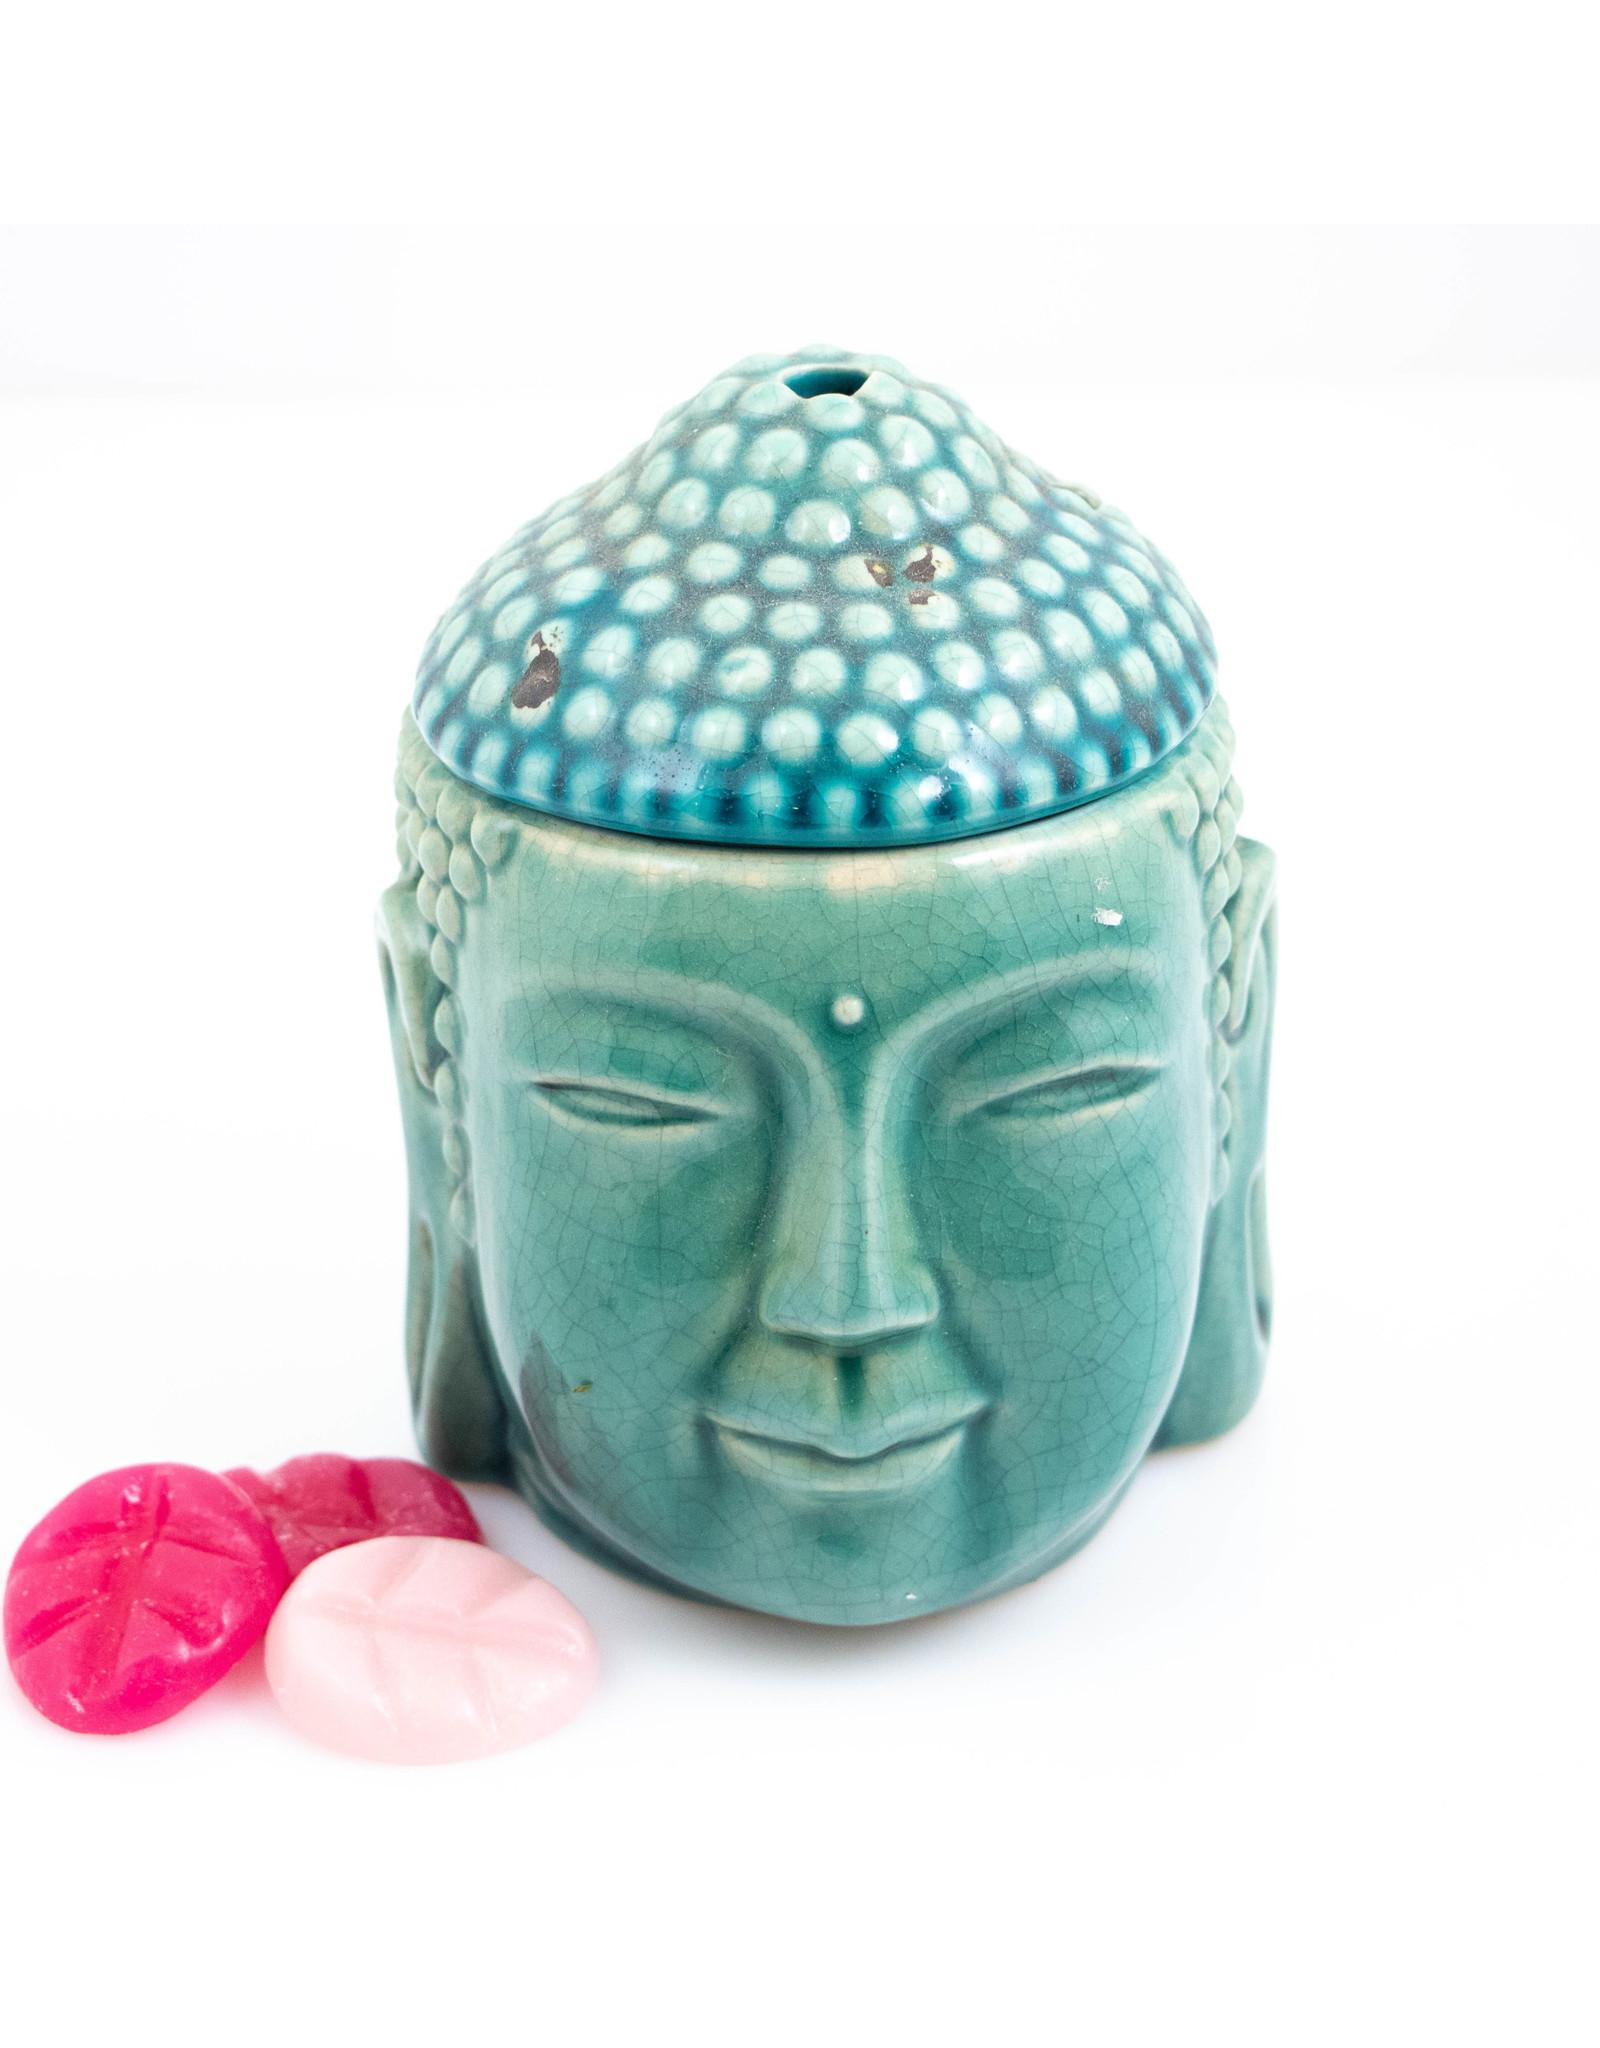 ScentBurner Buddha Head Turquoise